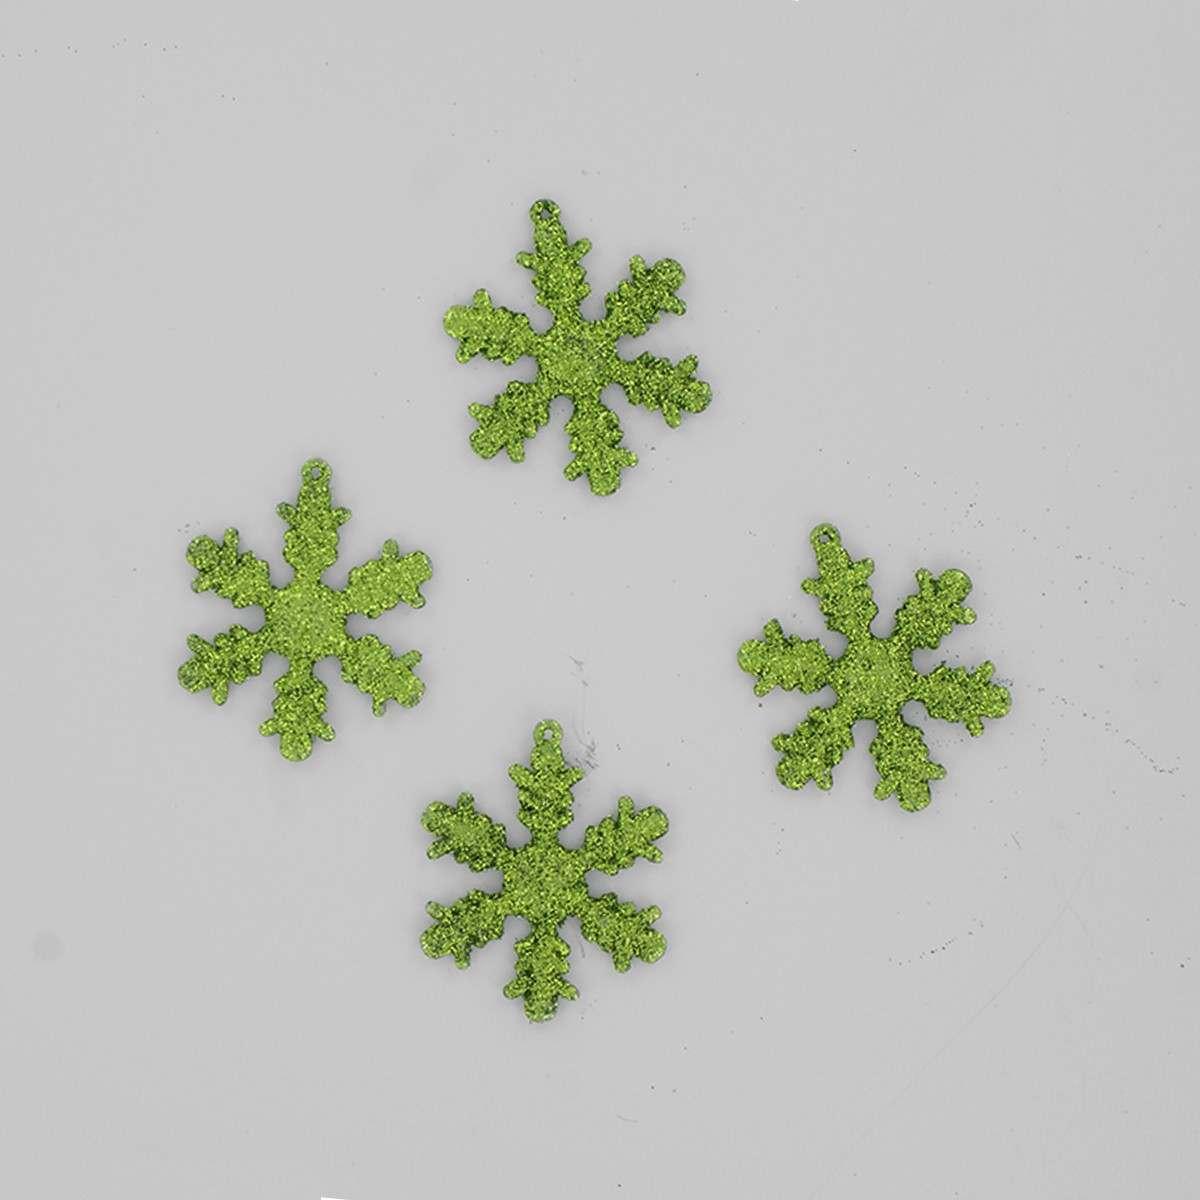 12 x 50mm Rich Green Shatterproof Snowflakes